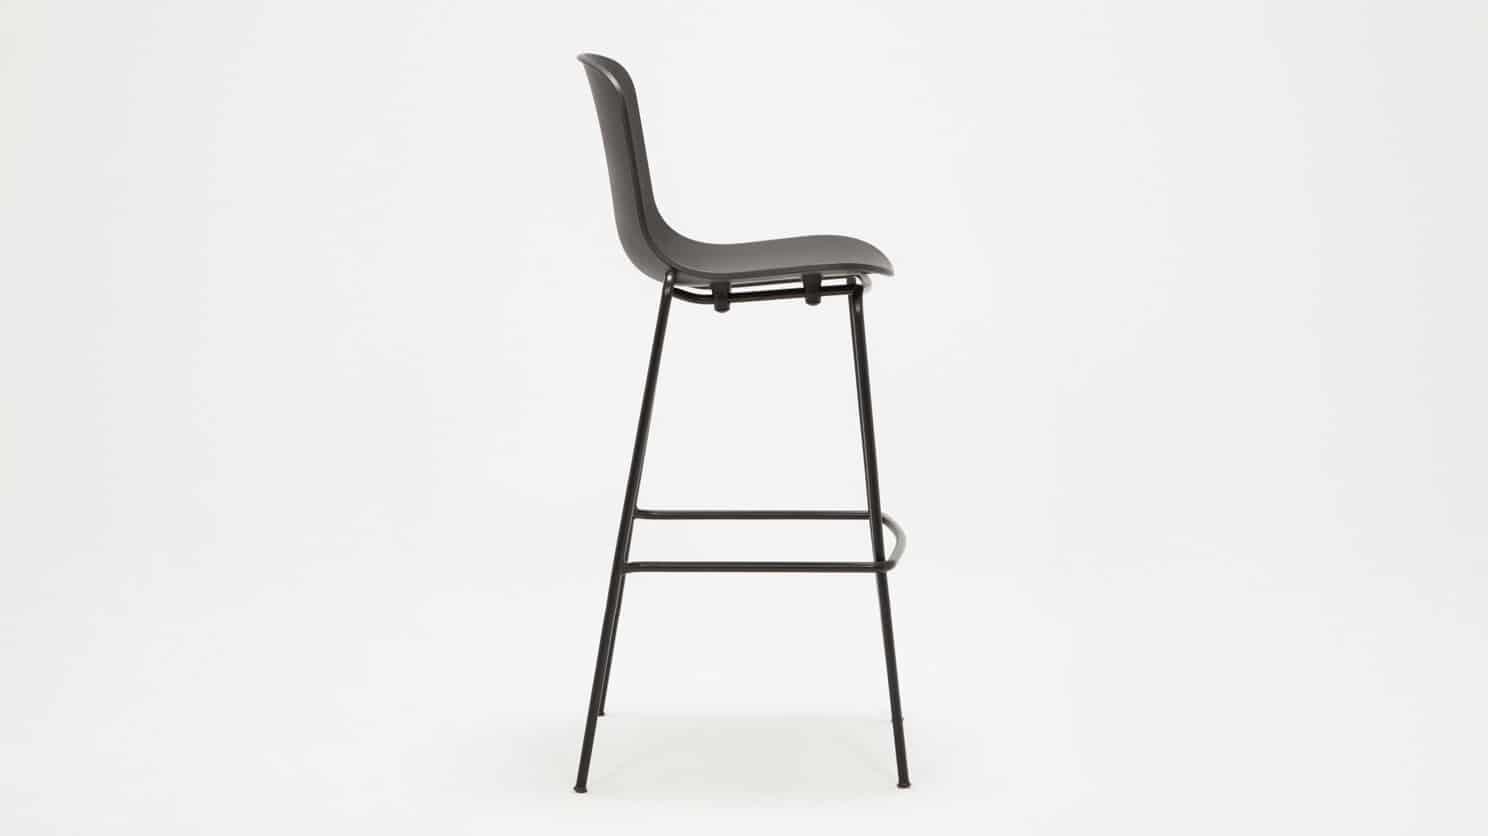 3020 293 par 6 stools holi bar stool black side 01